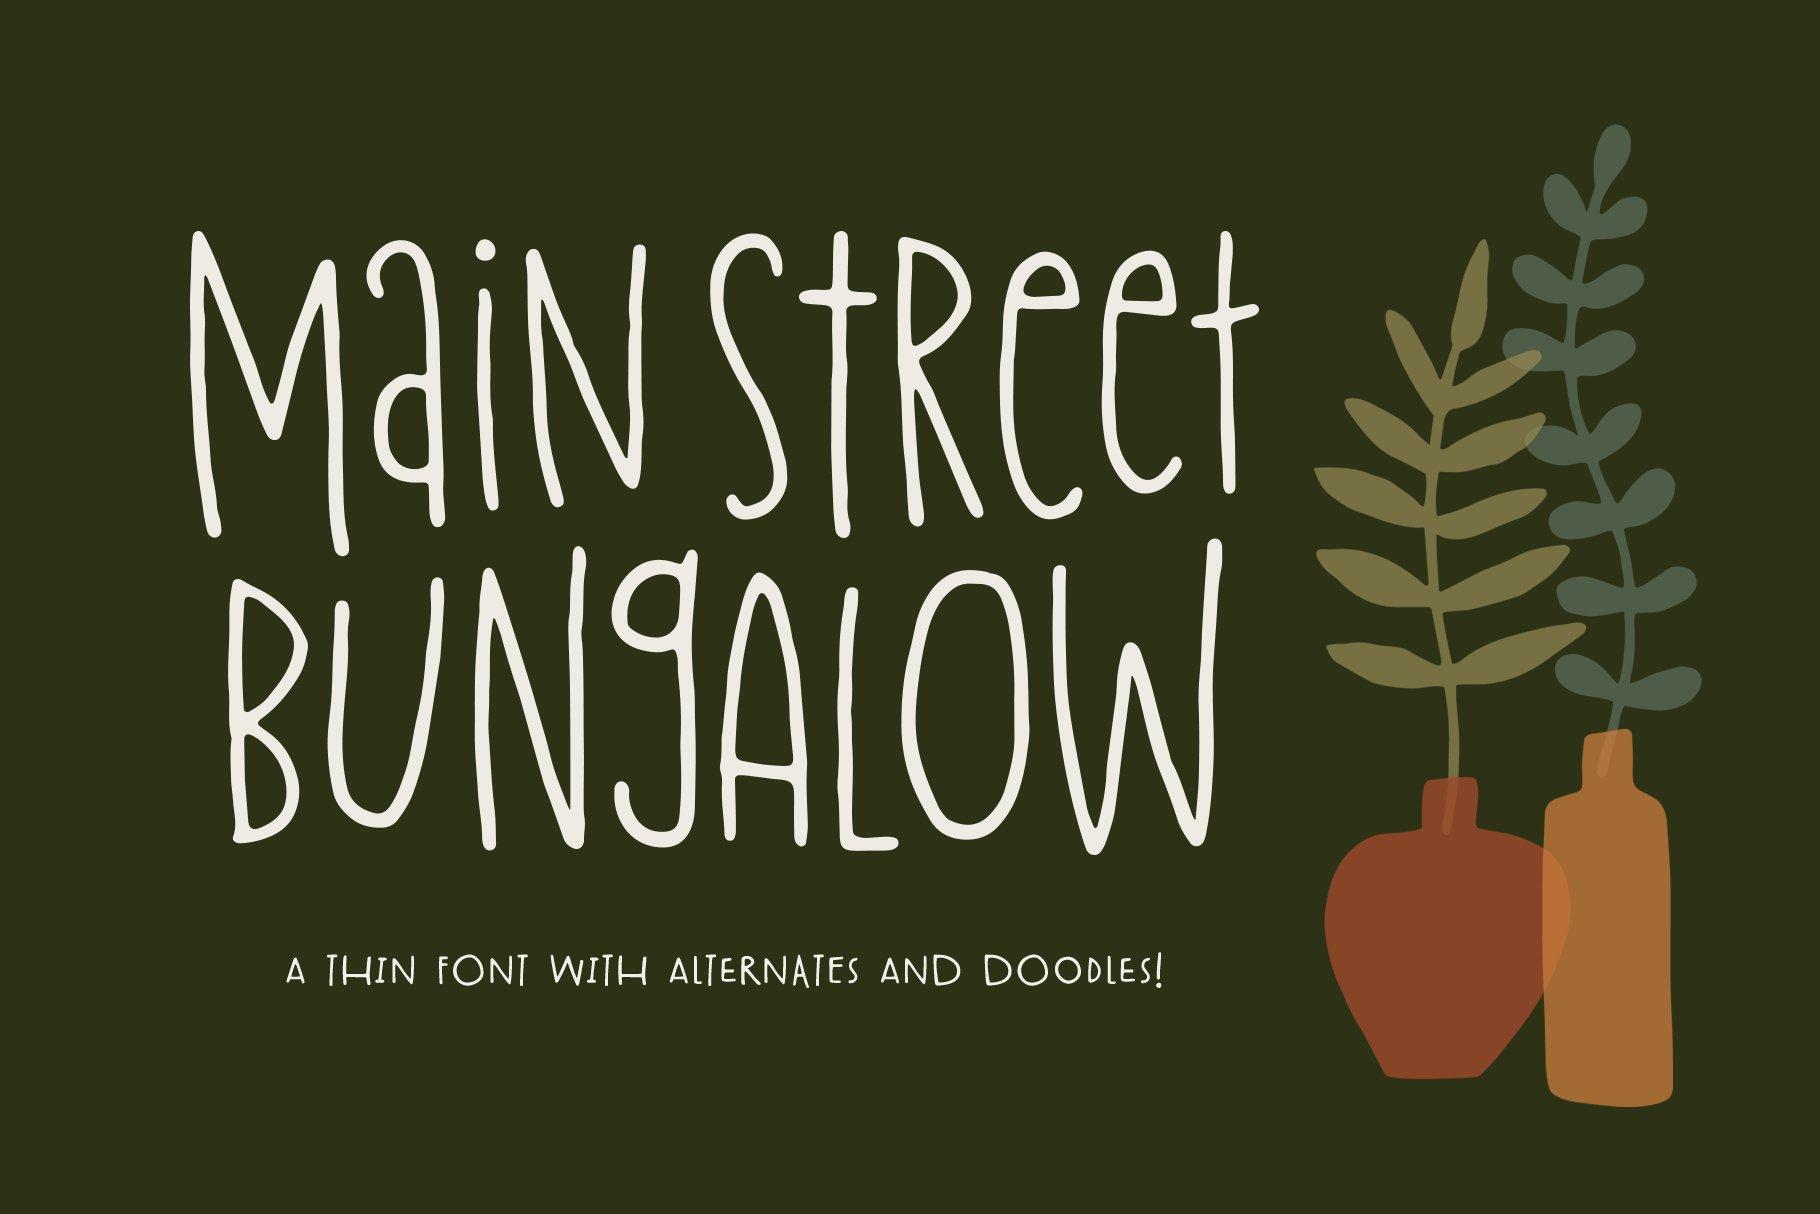 Main Street Bugalow